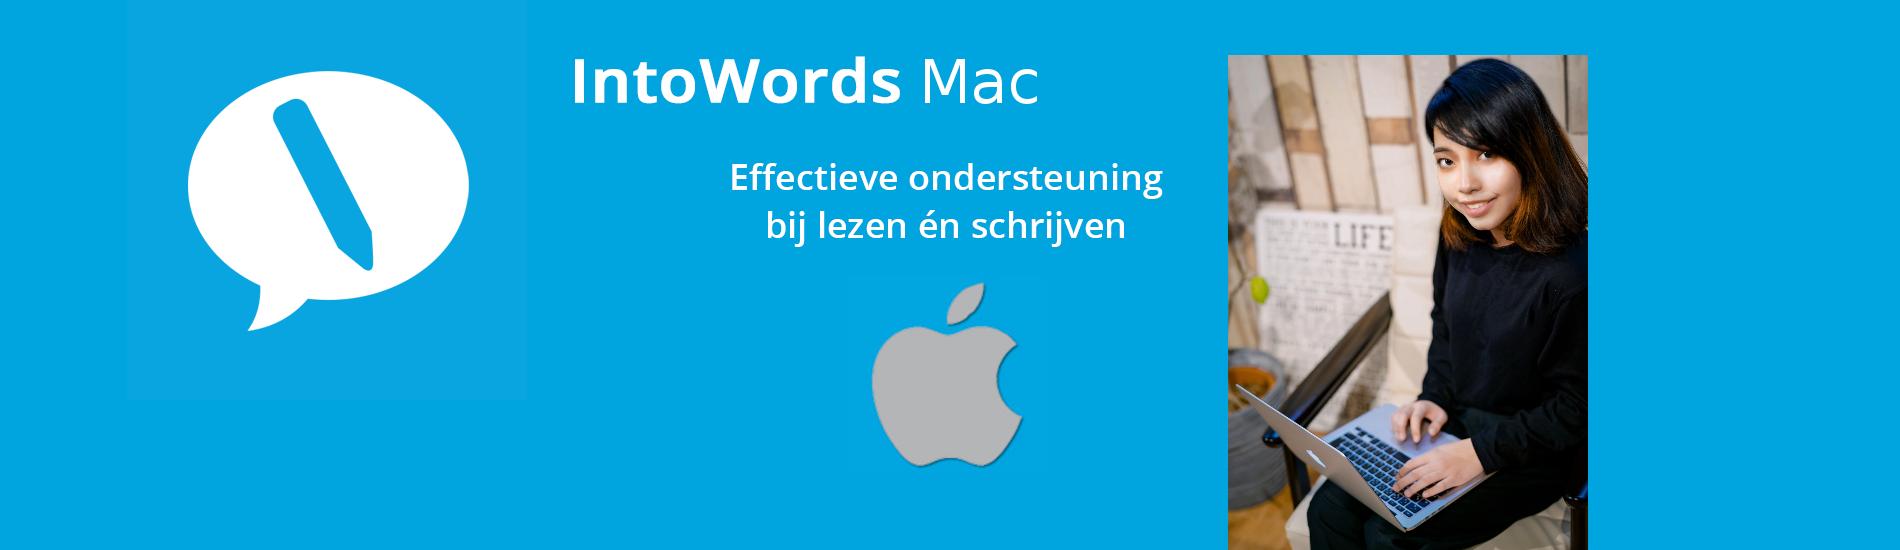 slider intowords mac